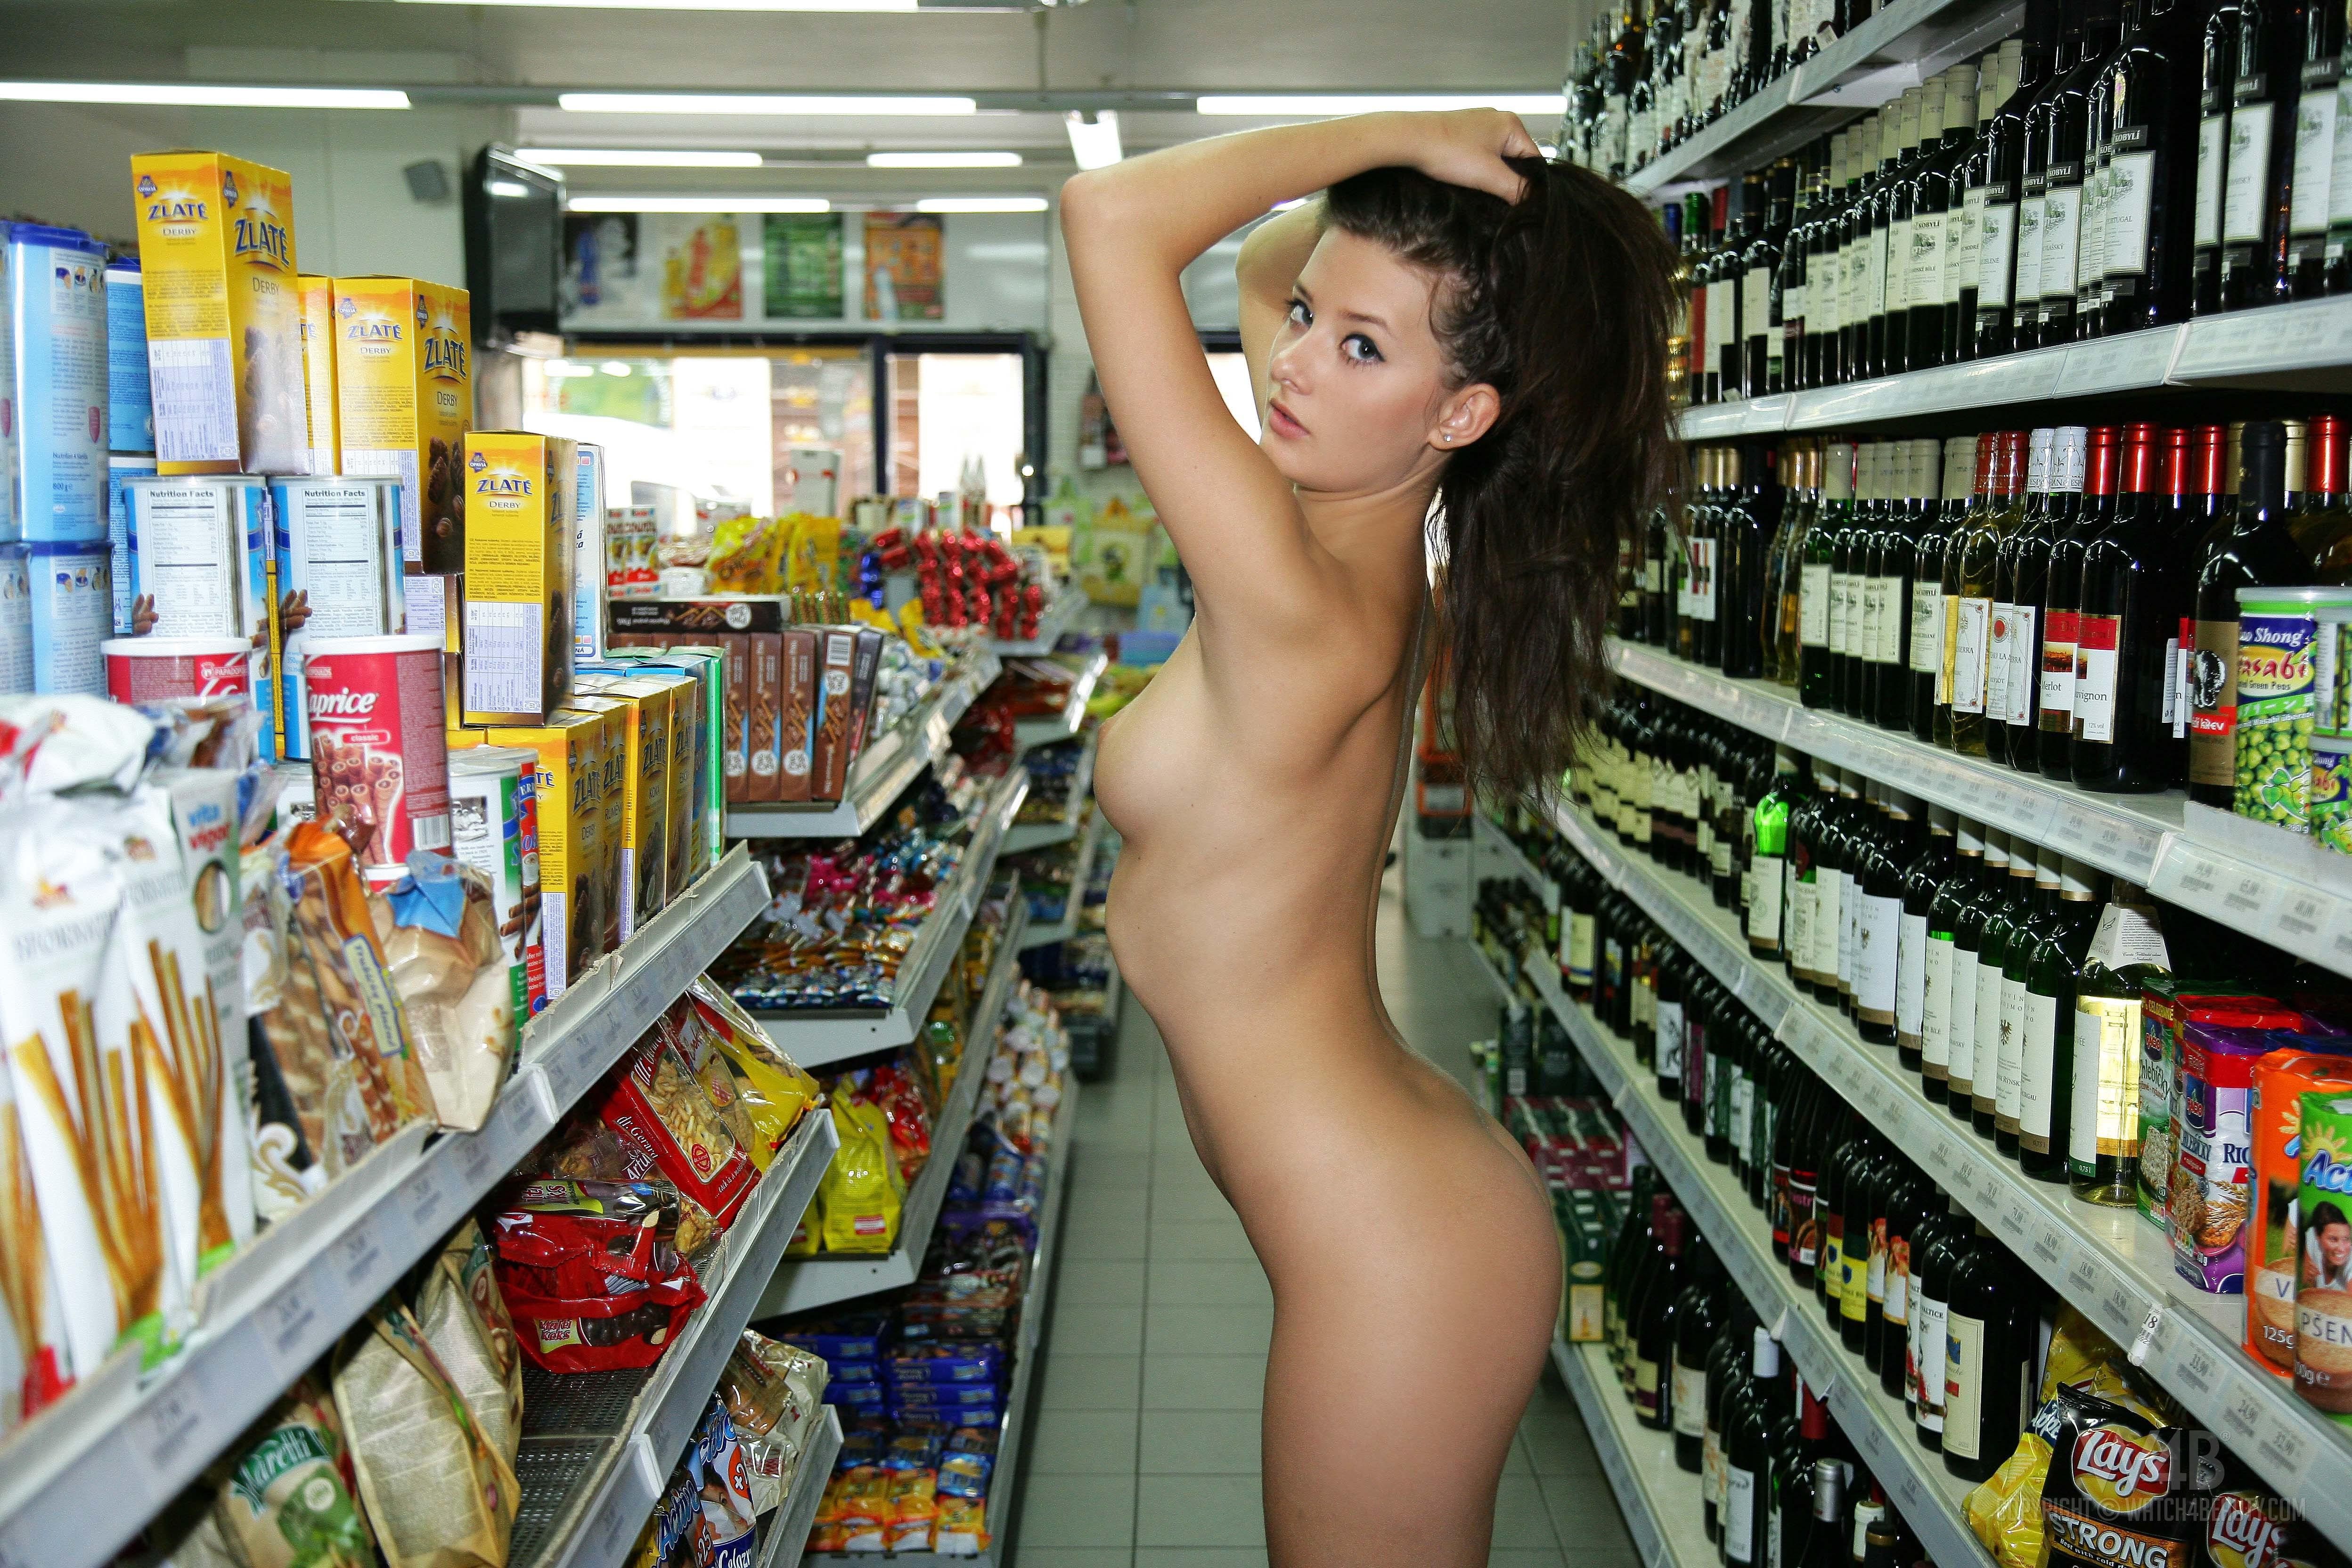 Woman naked shopping, nude uma jolie digital desire